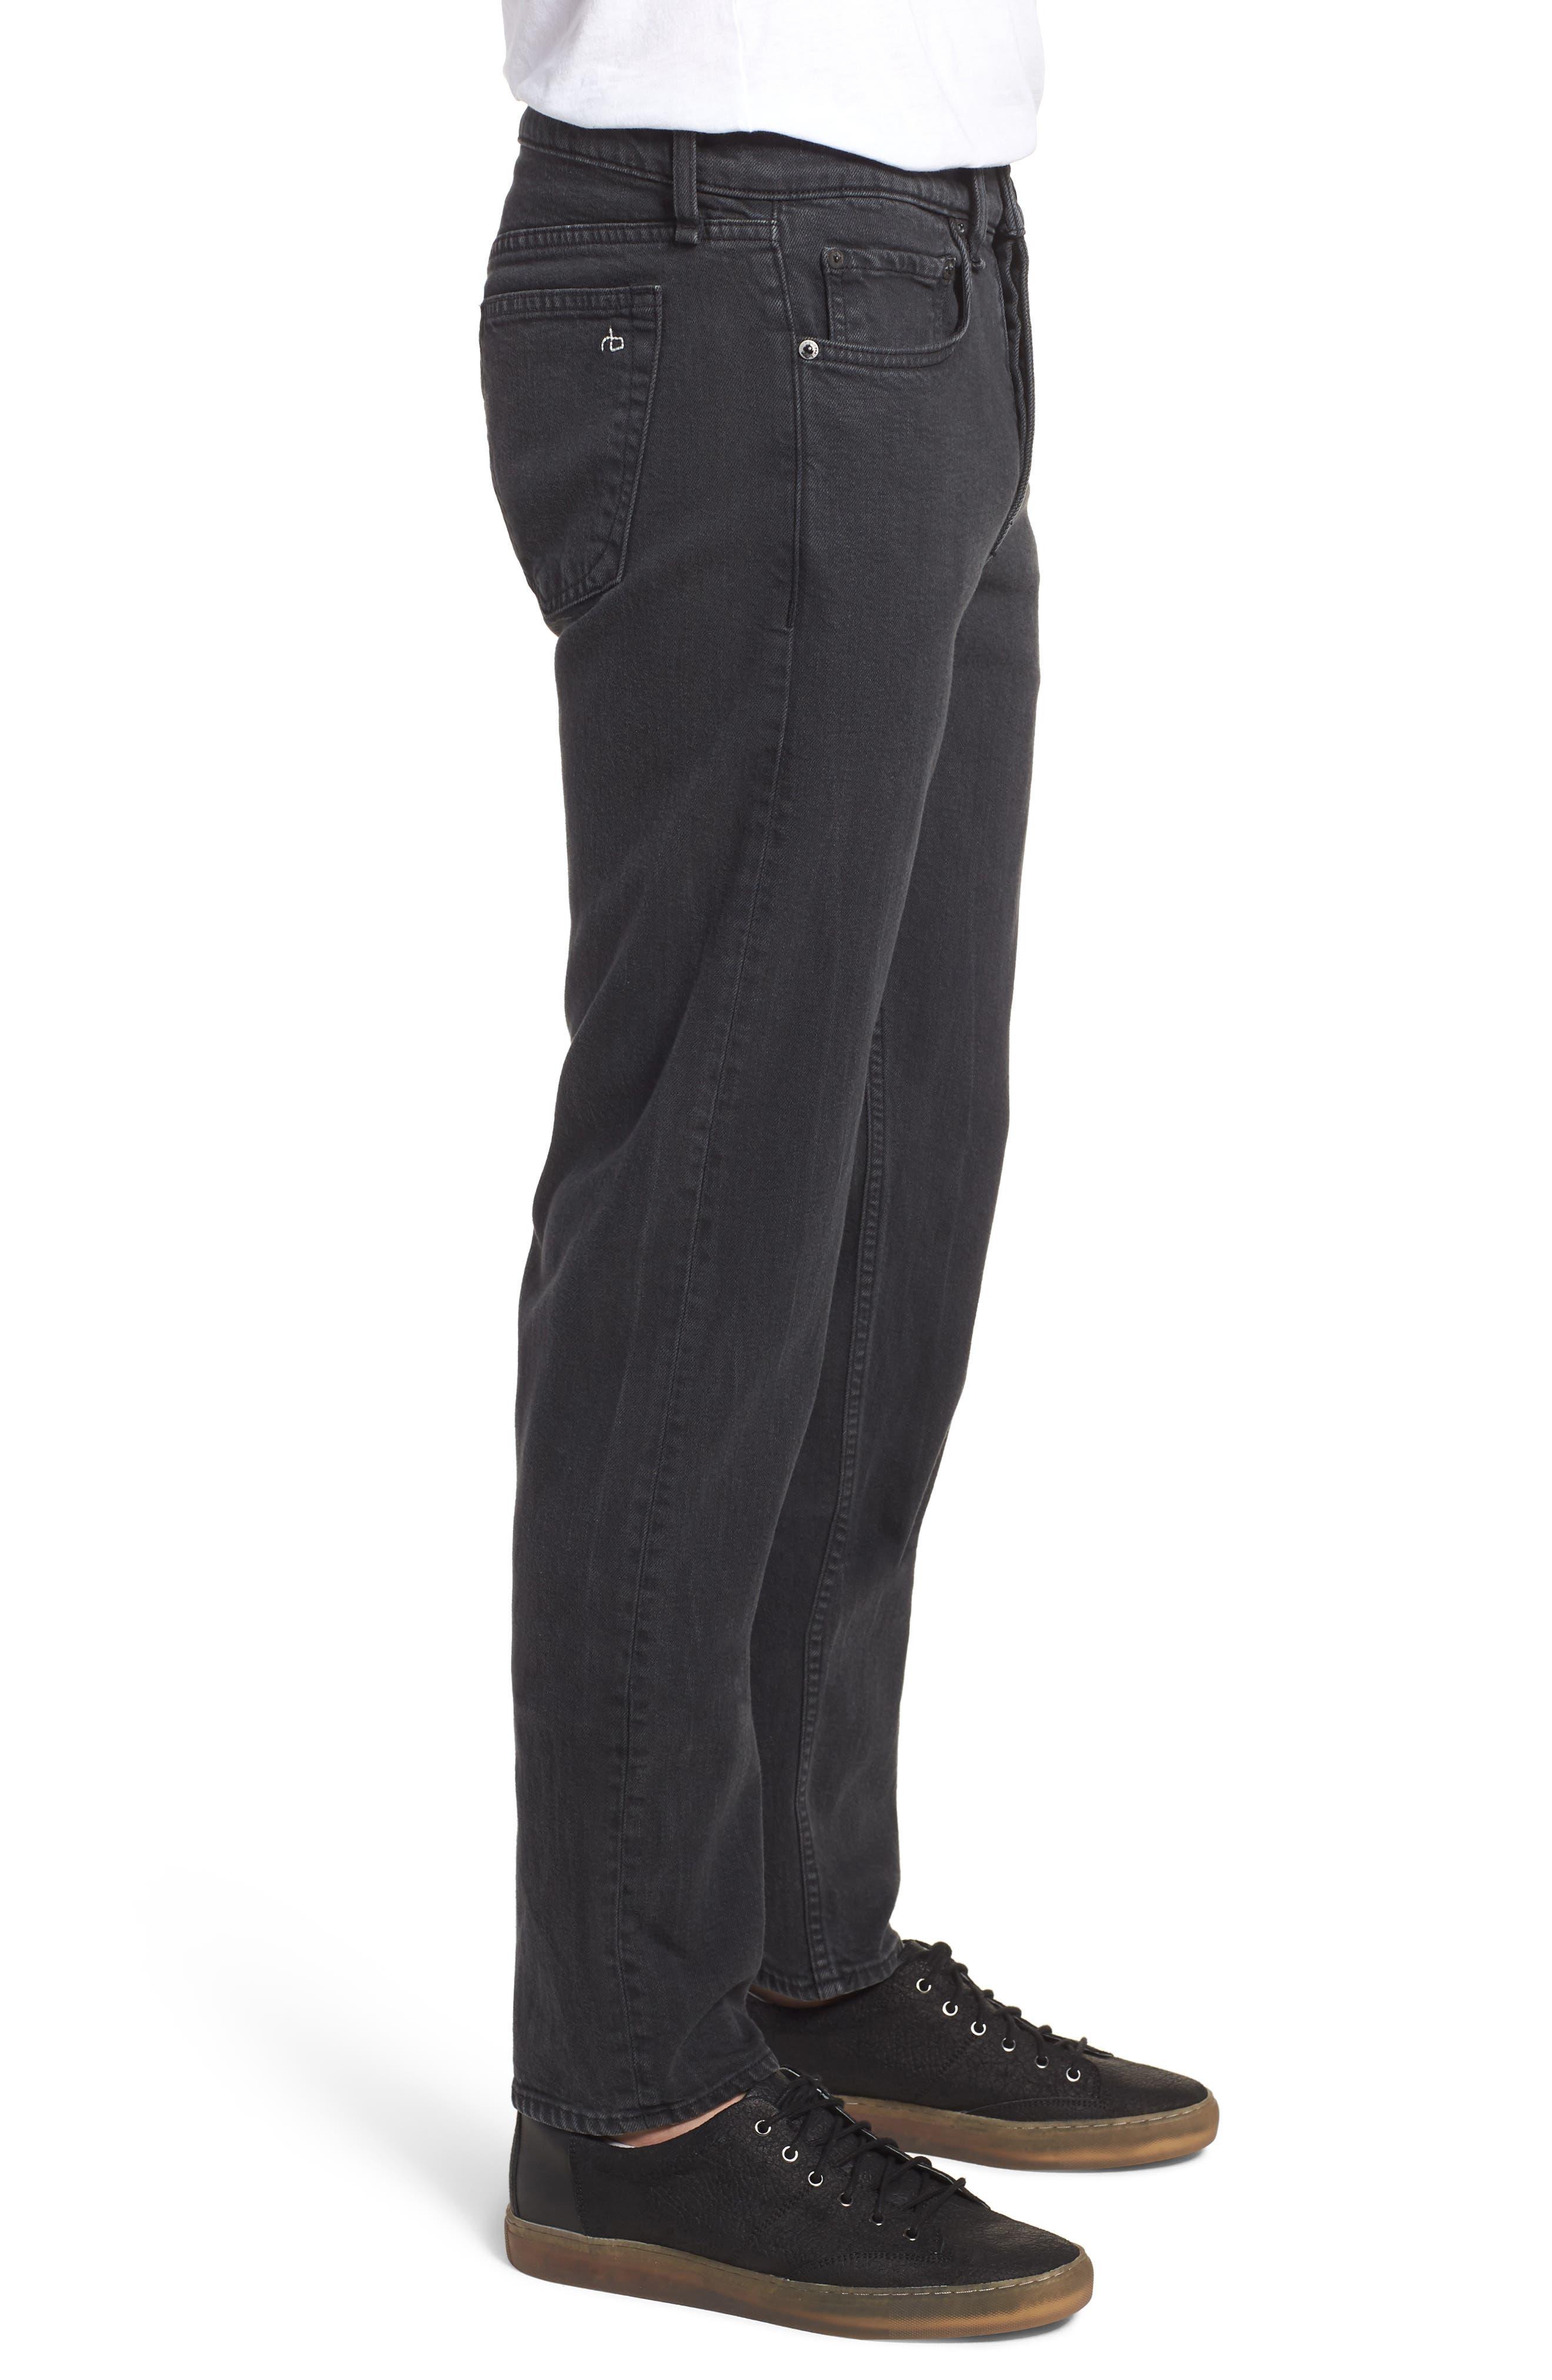 Fit 2 Slim Fit Jeans,                             Alternate thumbnail 3, color,                             SHELTER